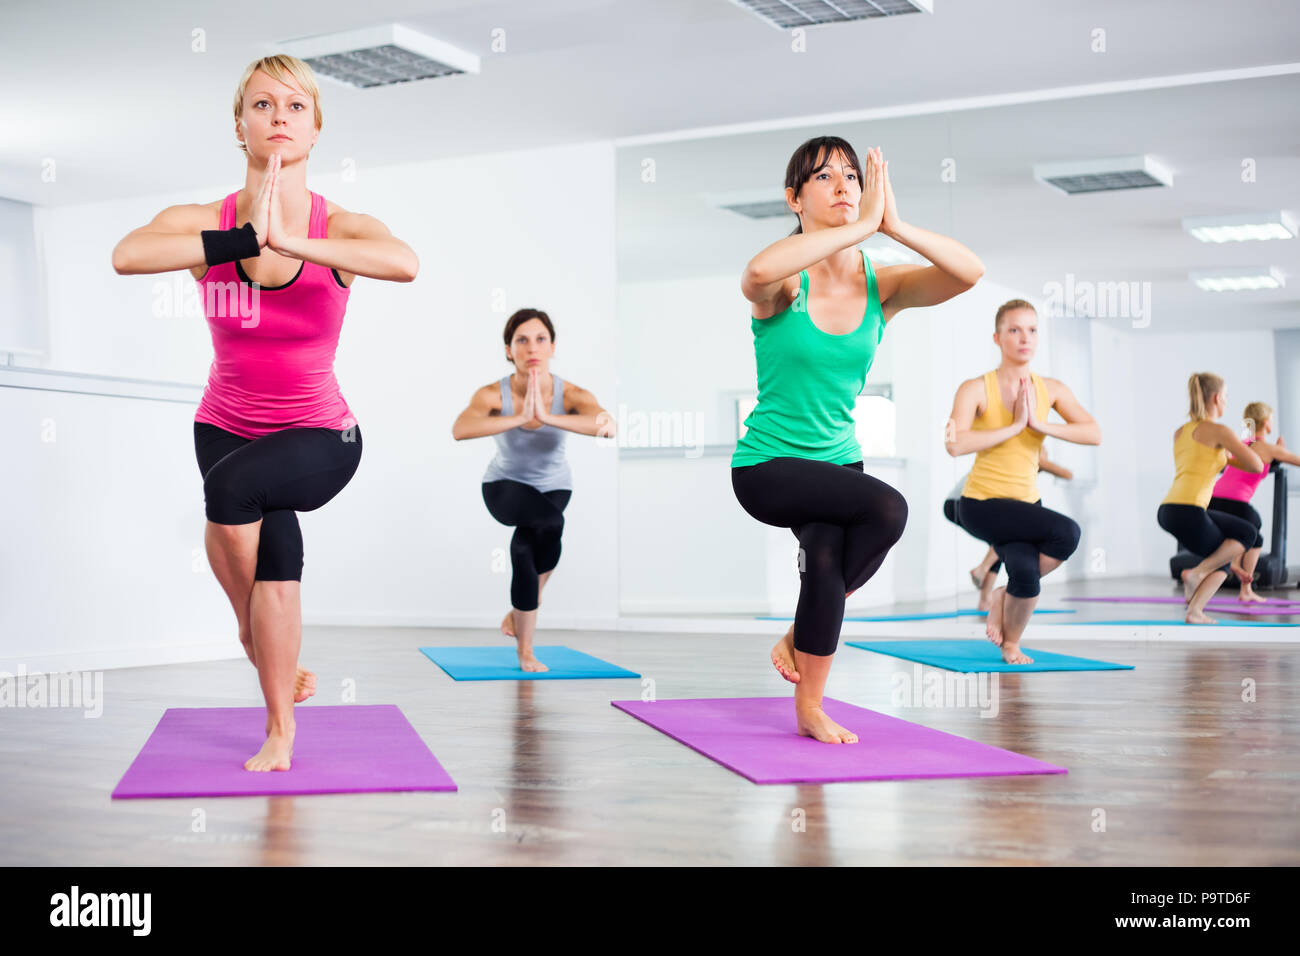 Four girls practicing yoga, Garudasana / Eagle Pose - Stock Image